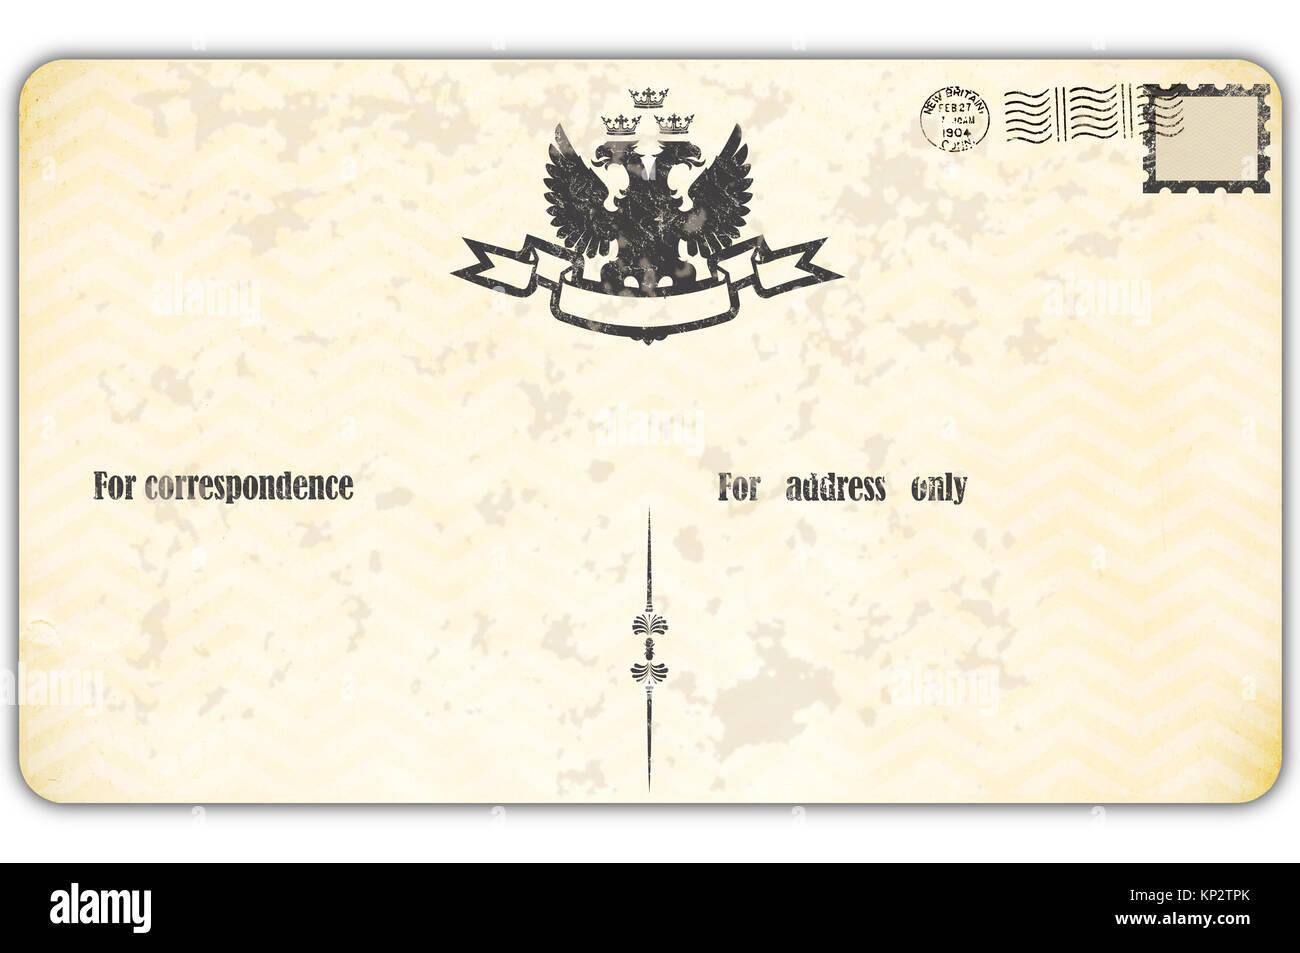 Nett Kostenlose Leere Postkarte Vorlage Fotos - Entry Level Resume ...